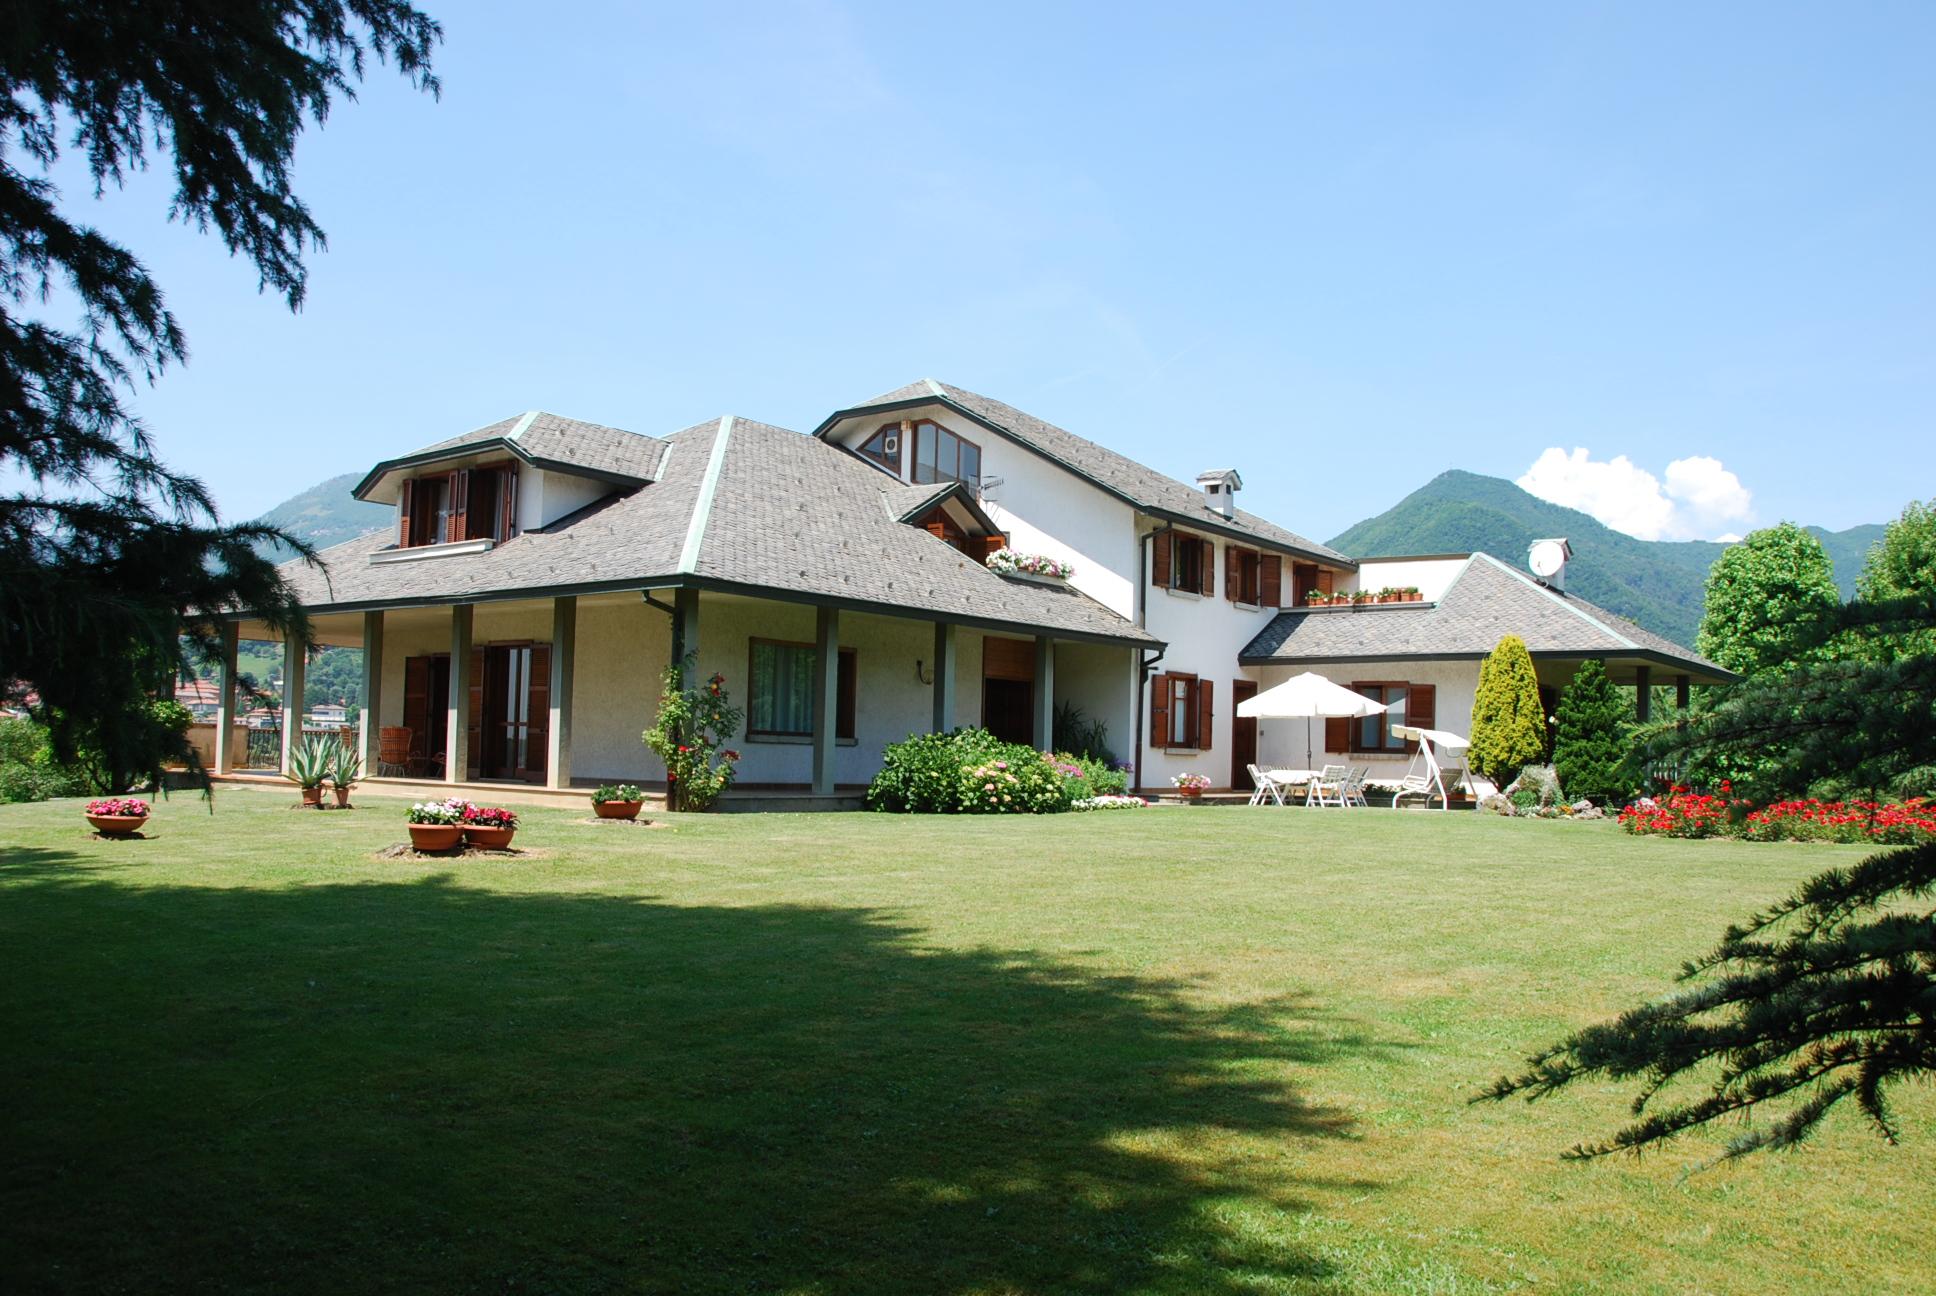 Villa D'Almè – Villa singola con parco